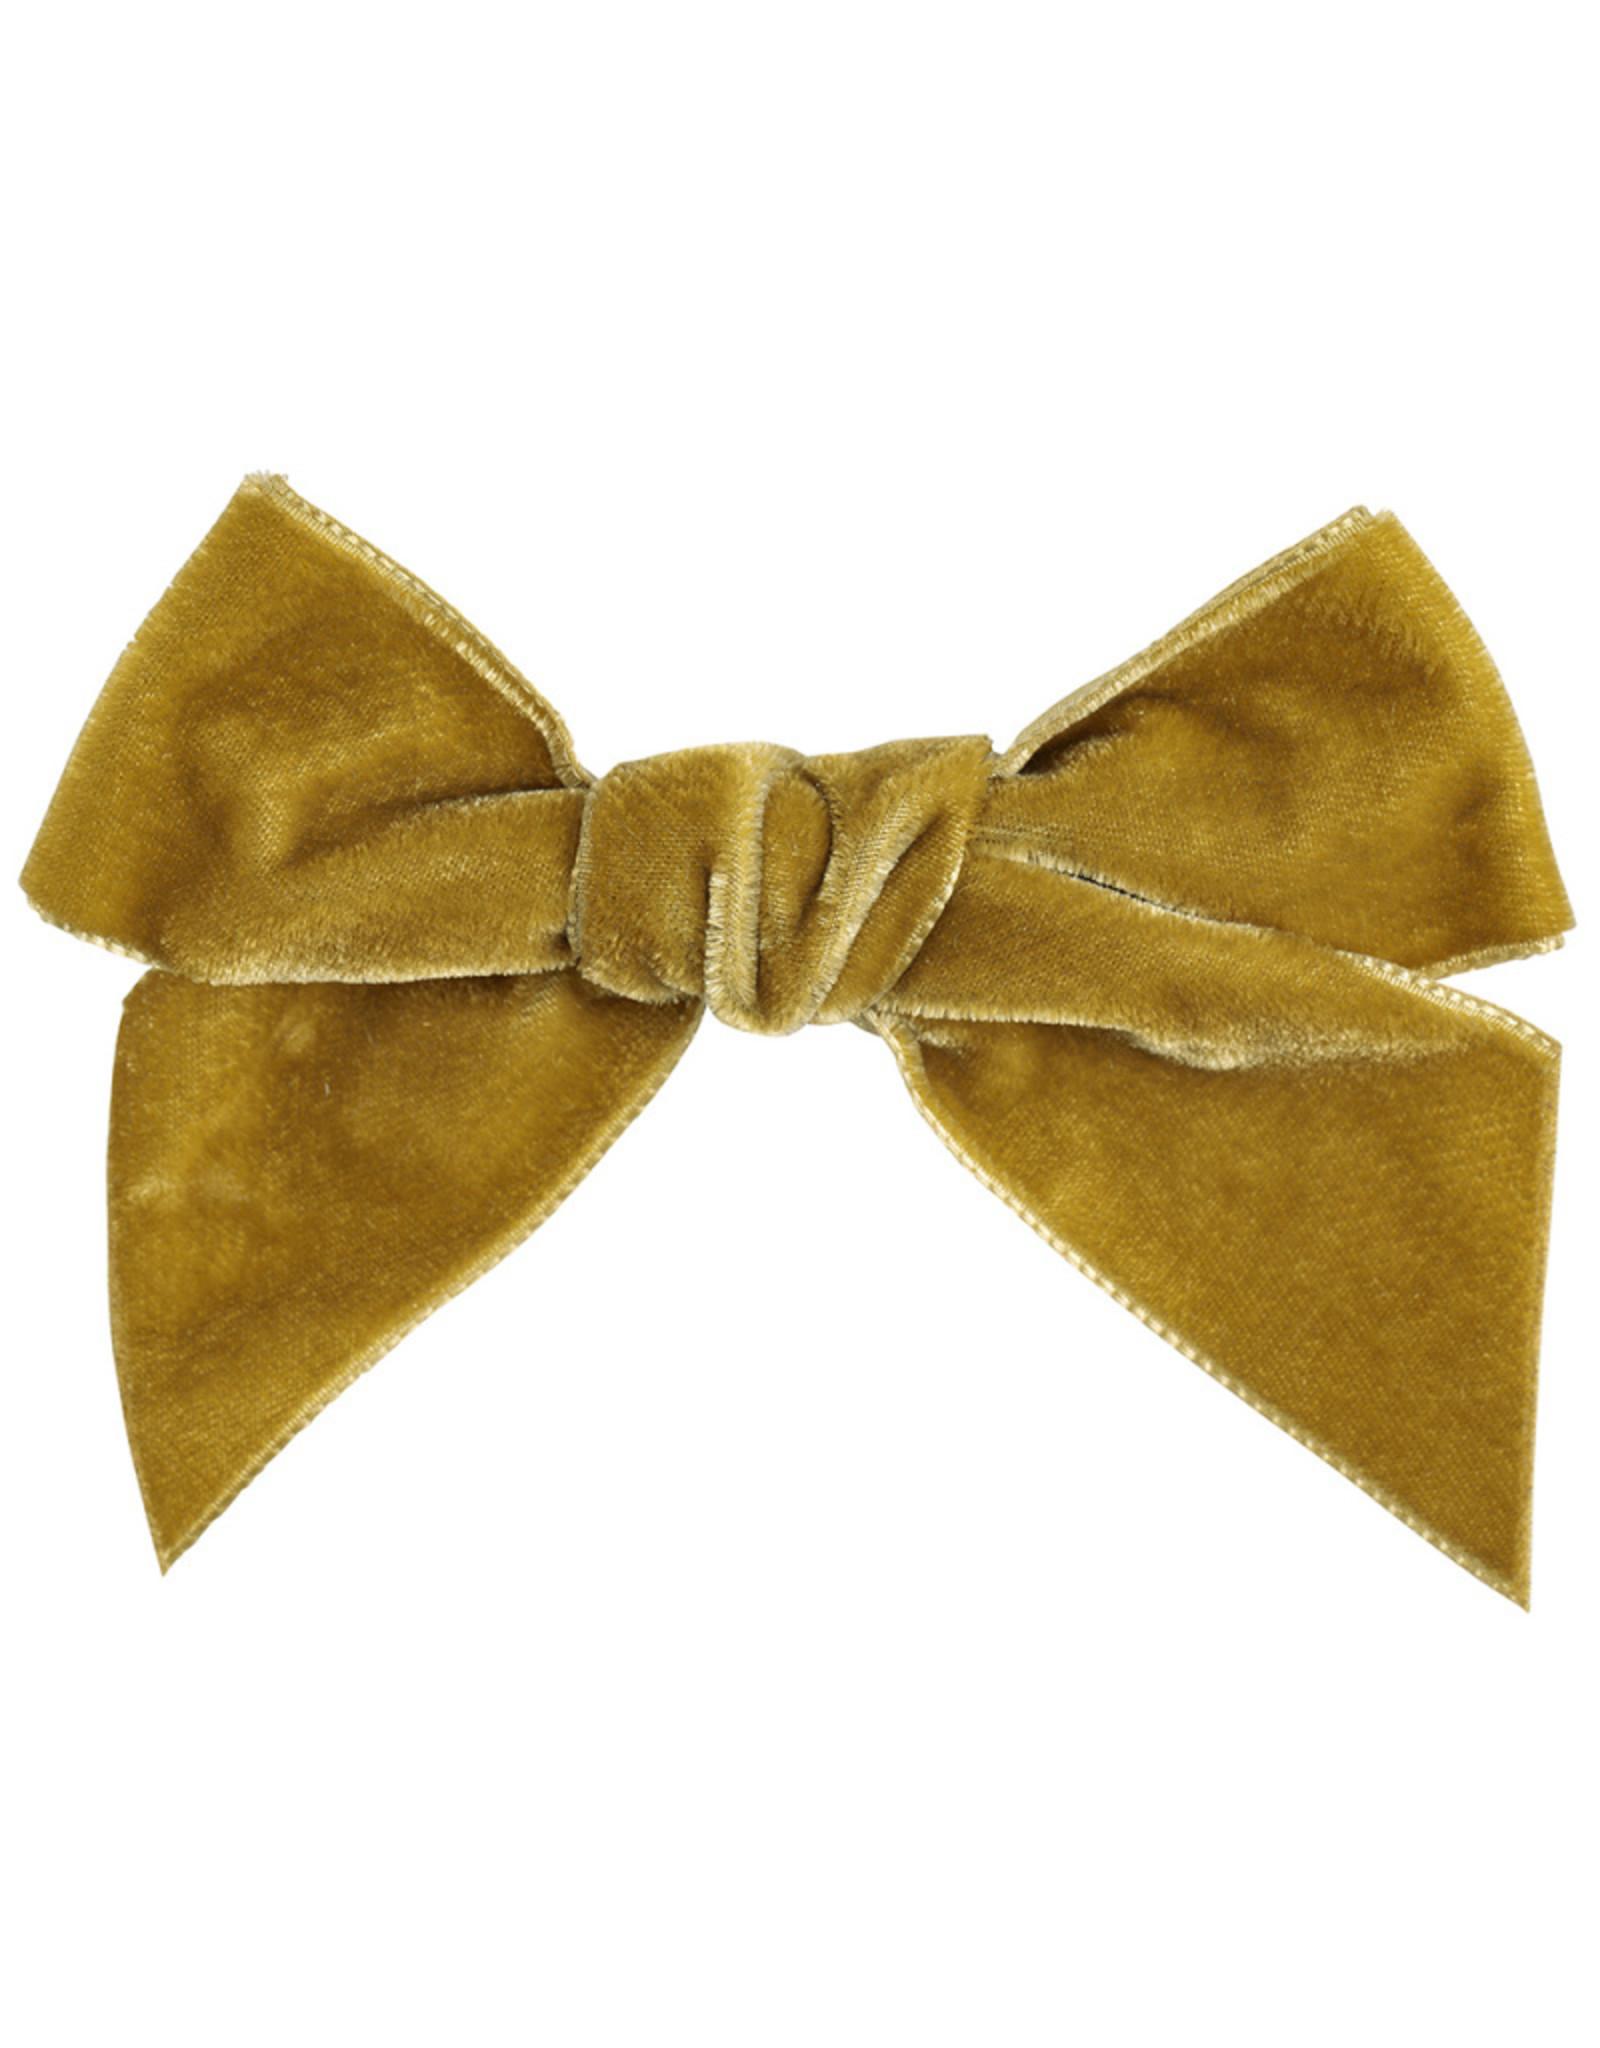 CONDOR Mustard Velvet Hair Bow